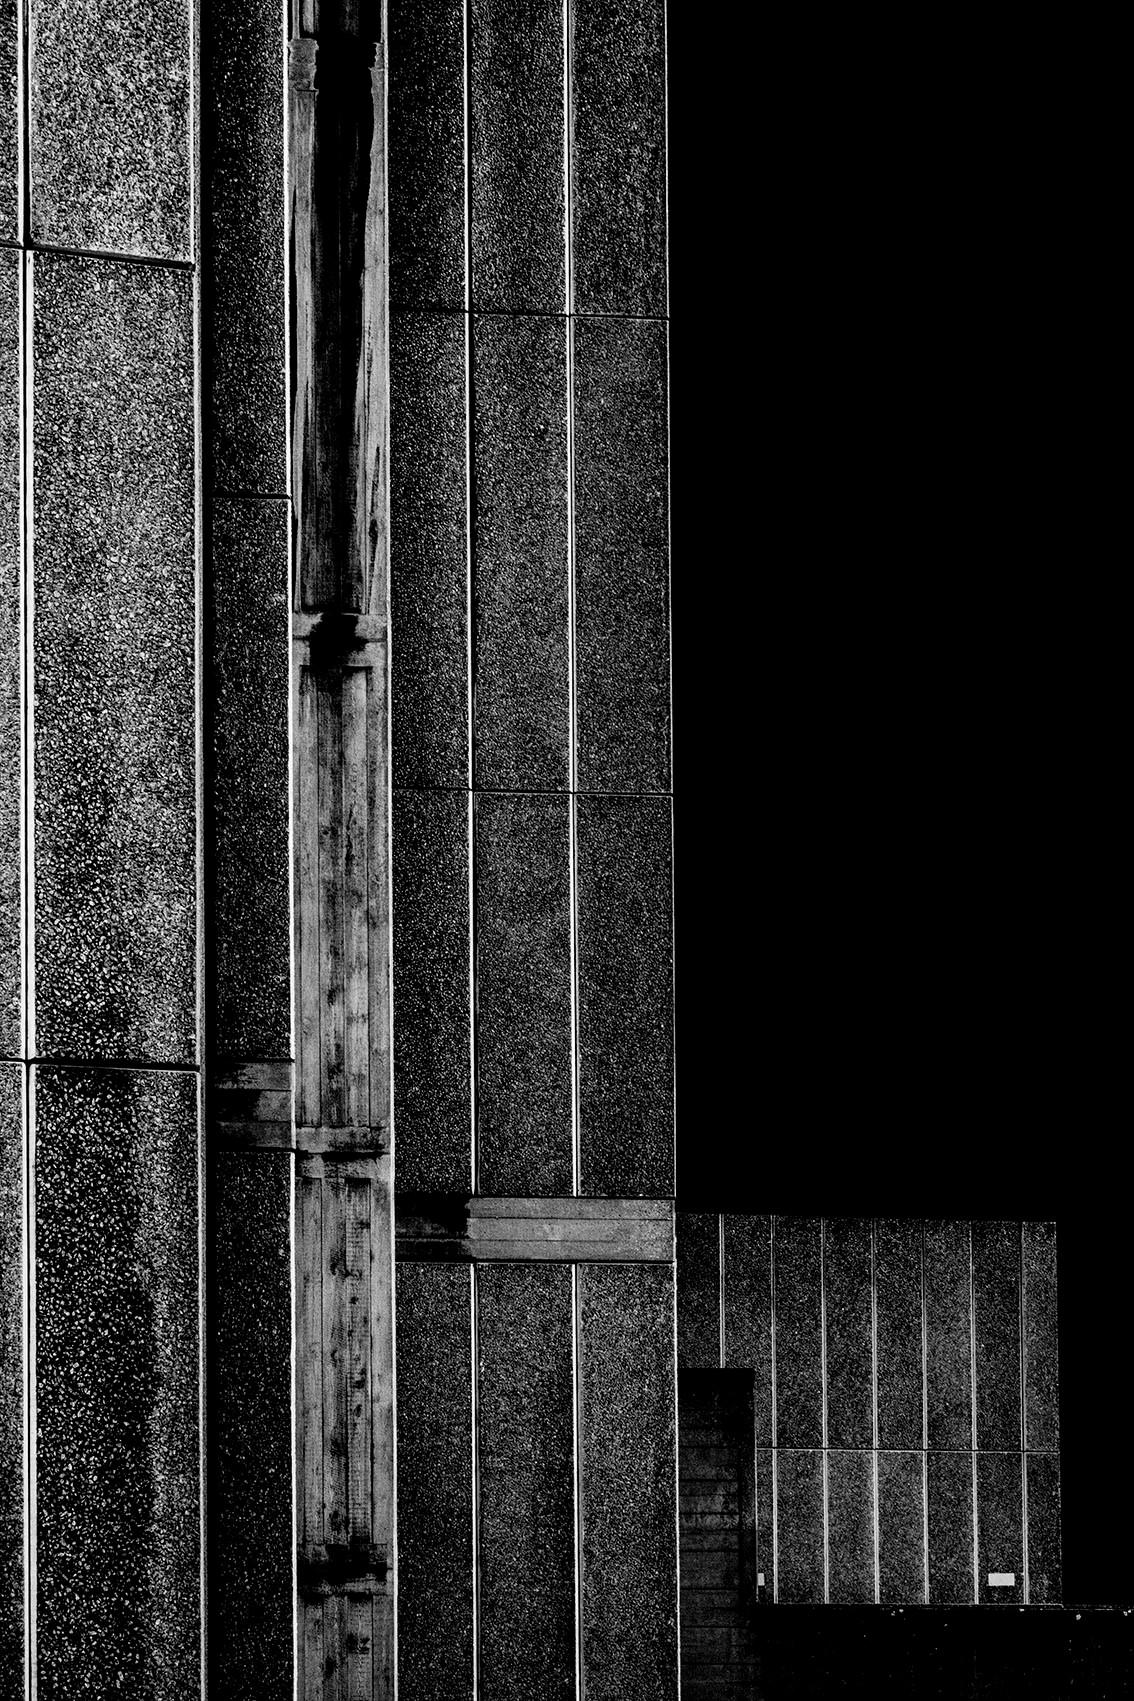 Southbank Centre #15